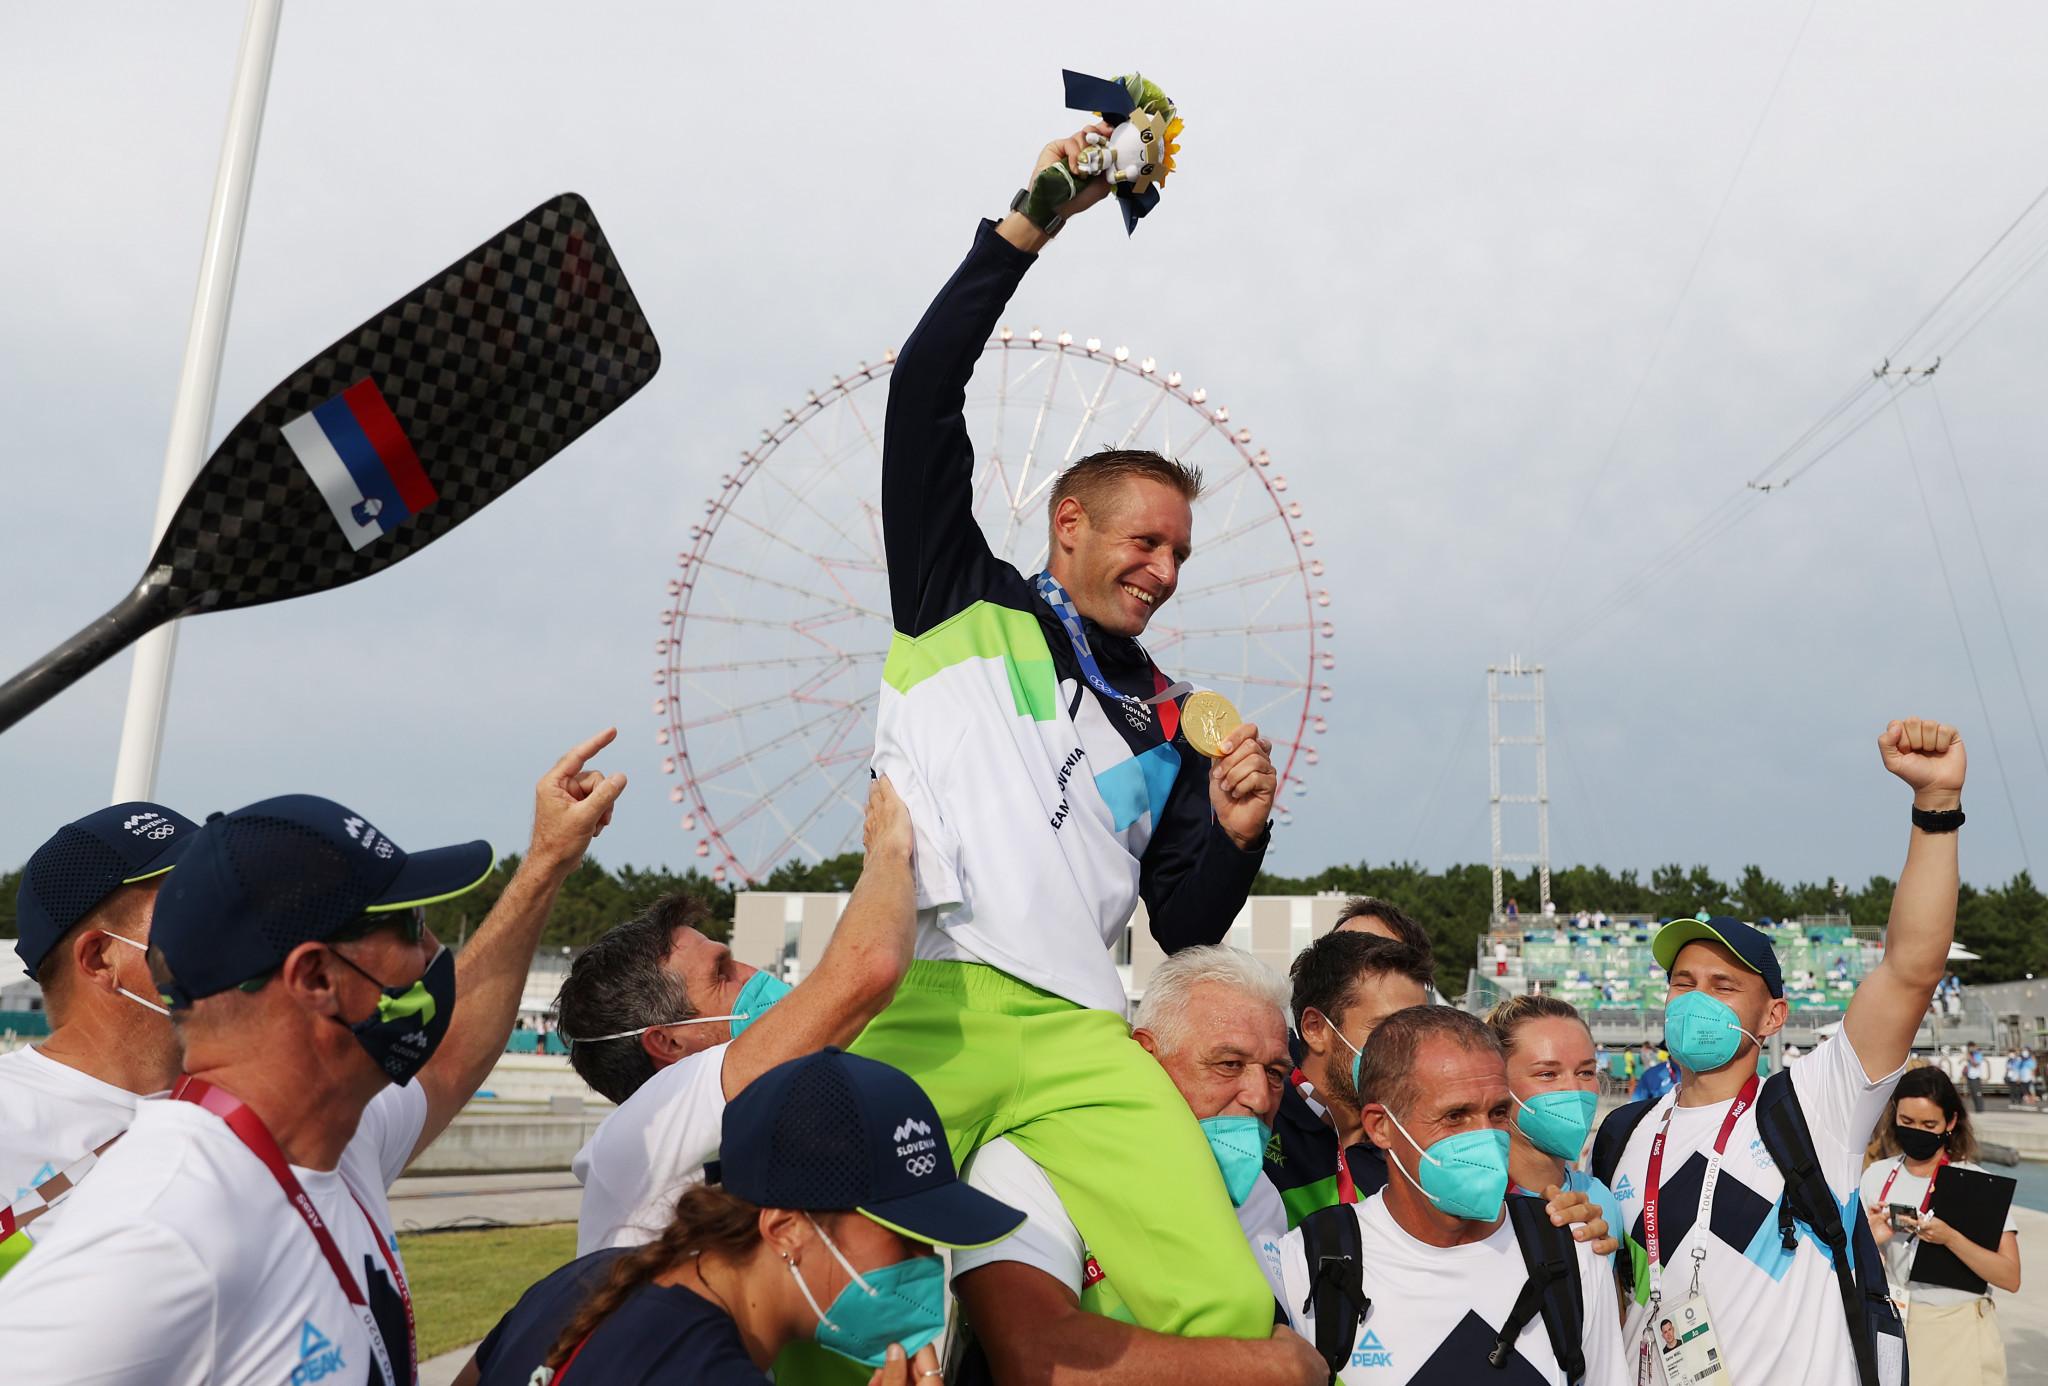 Benjamin Savšek became Slovenia's first Olympic champion in canoe slalom ©Getty Images